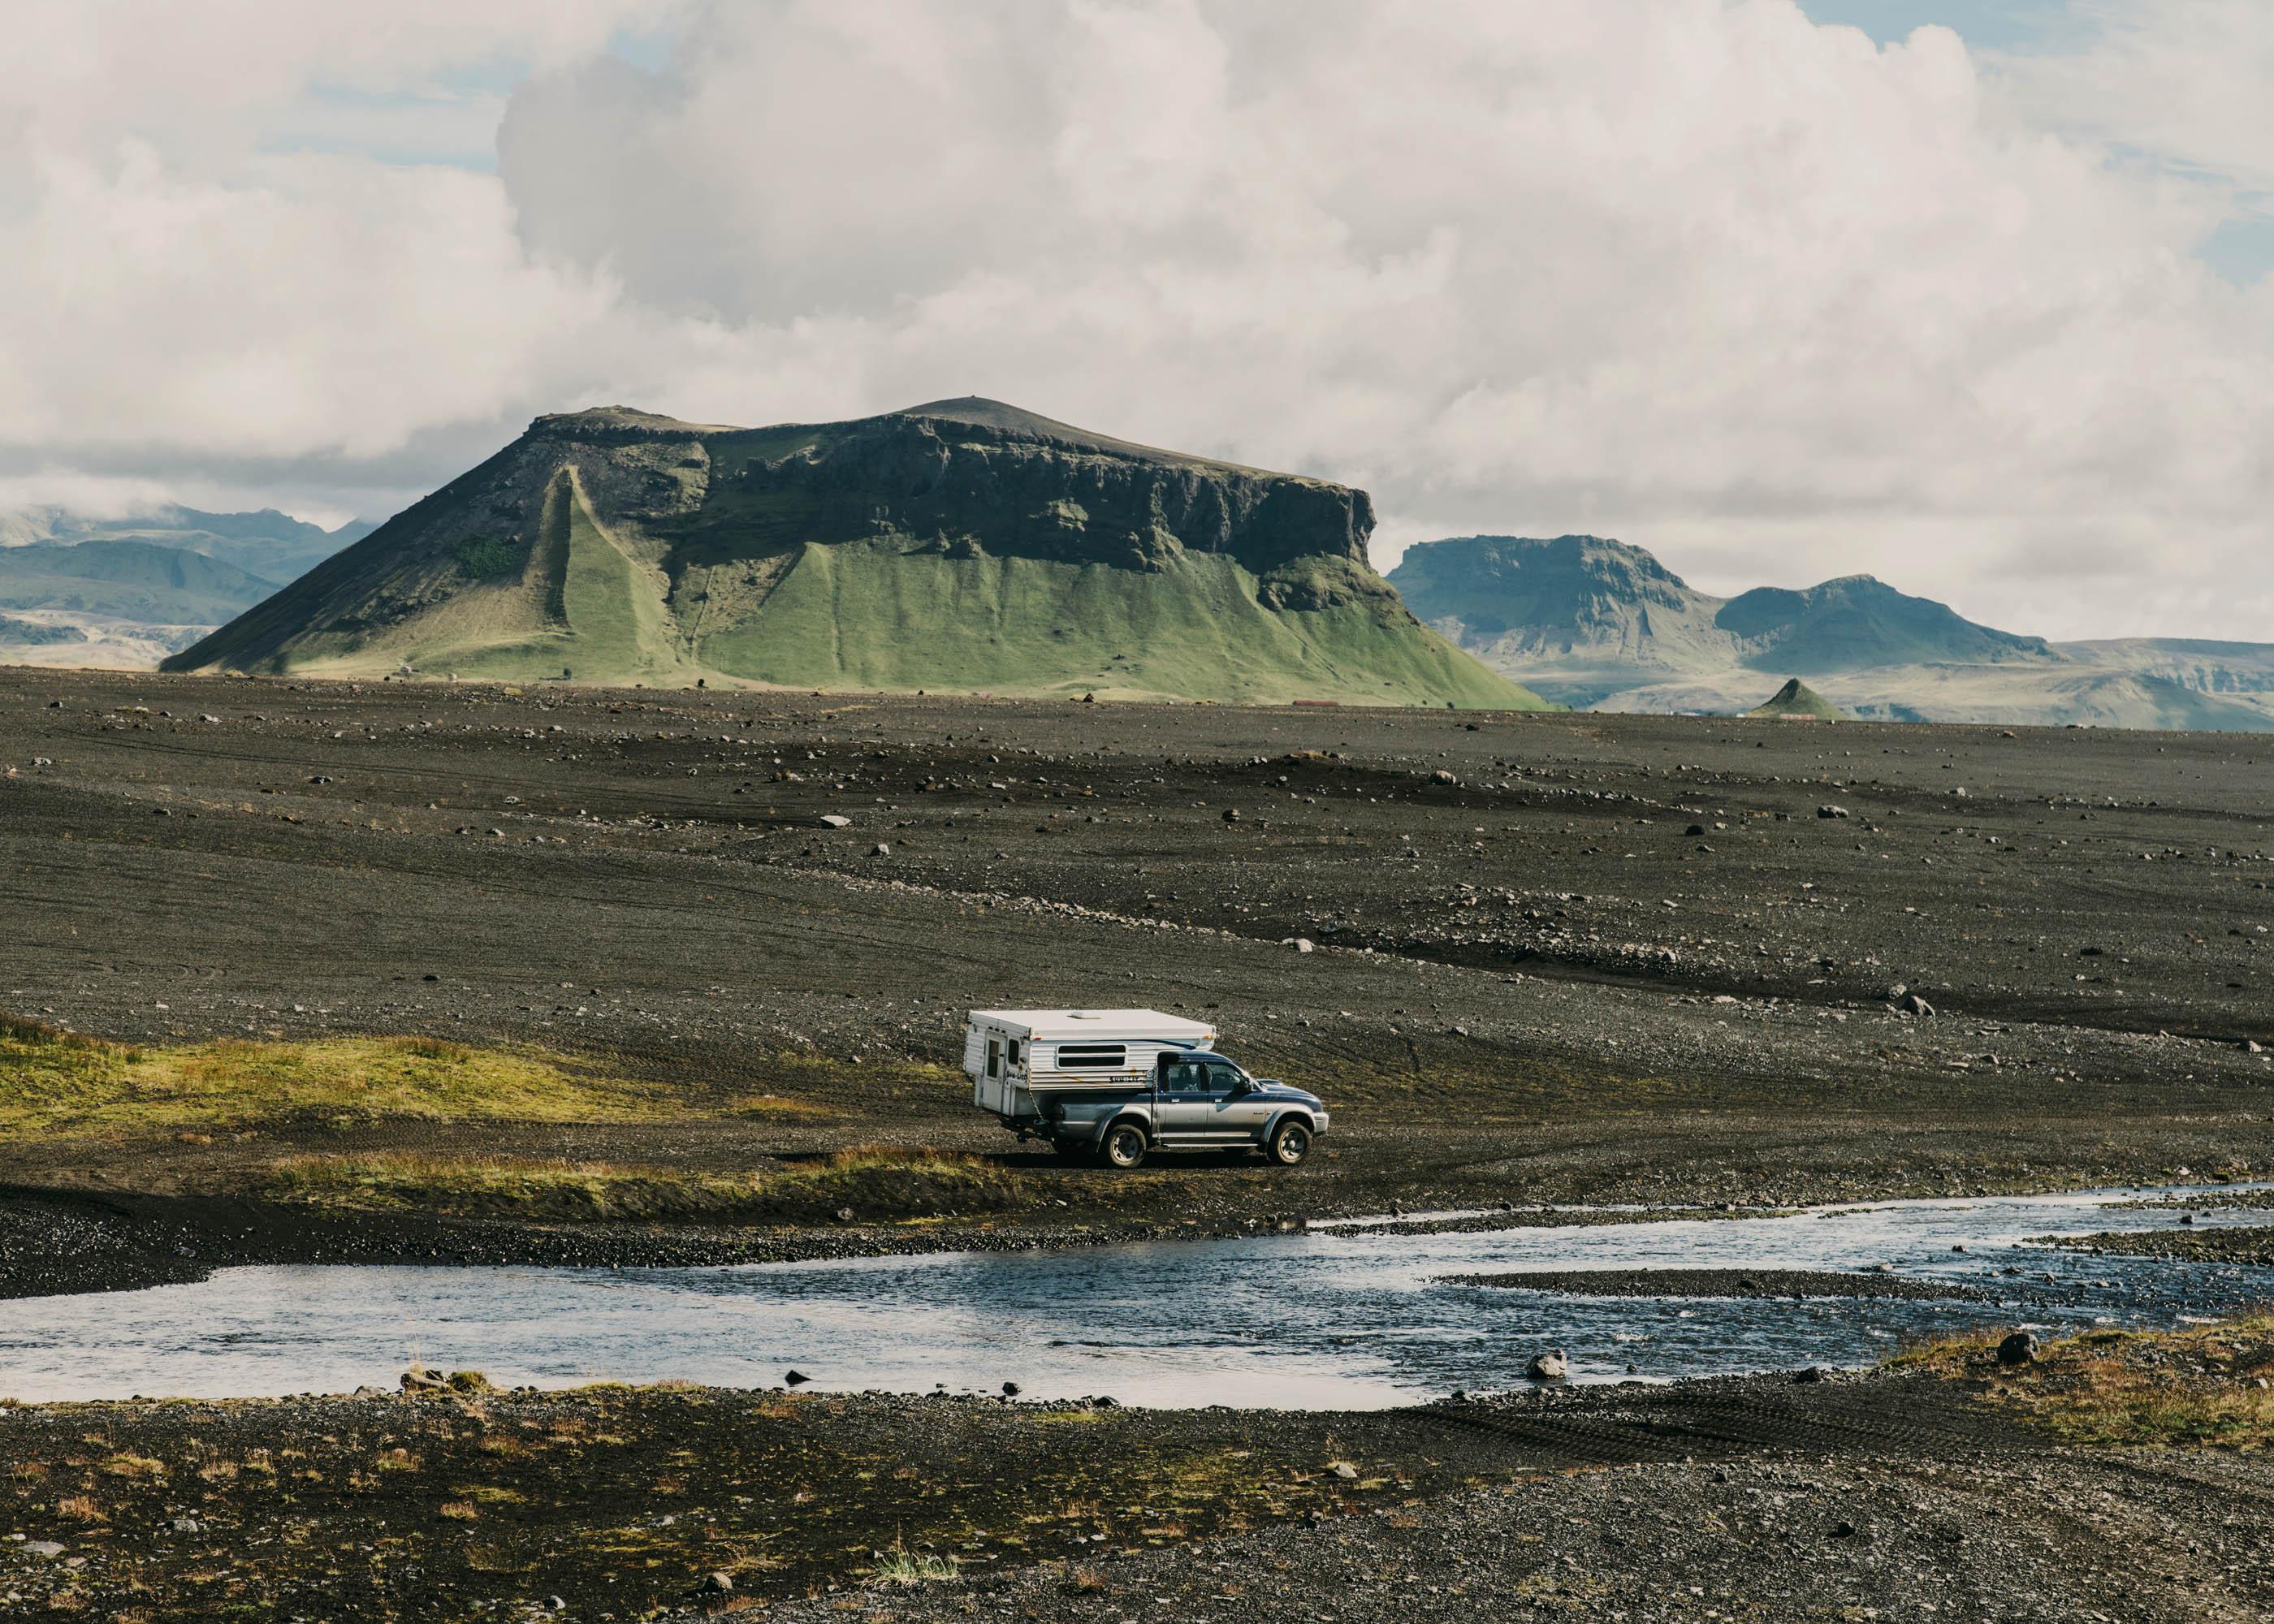 #1617 #personal #iceland #caravan #landscapes